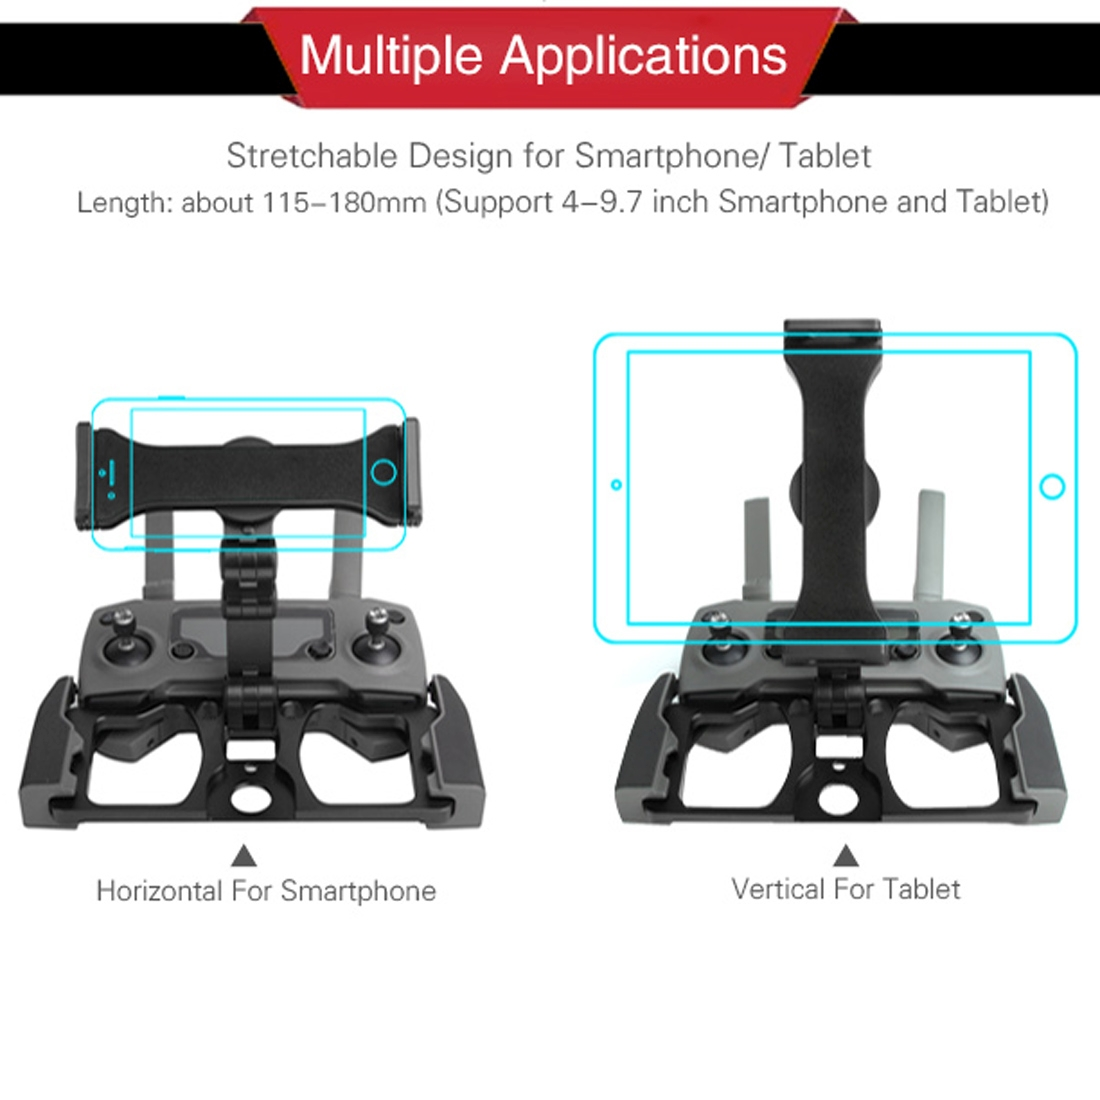 Sunnylife TY-ZJ034 Upgrade Full Aluminum Alloy Smartphone & Tablet Holder for DJI Mavic 2 / Mavic Pro / Mavic Air / Spark (Black)